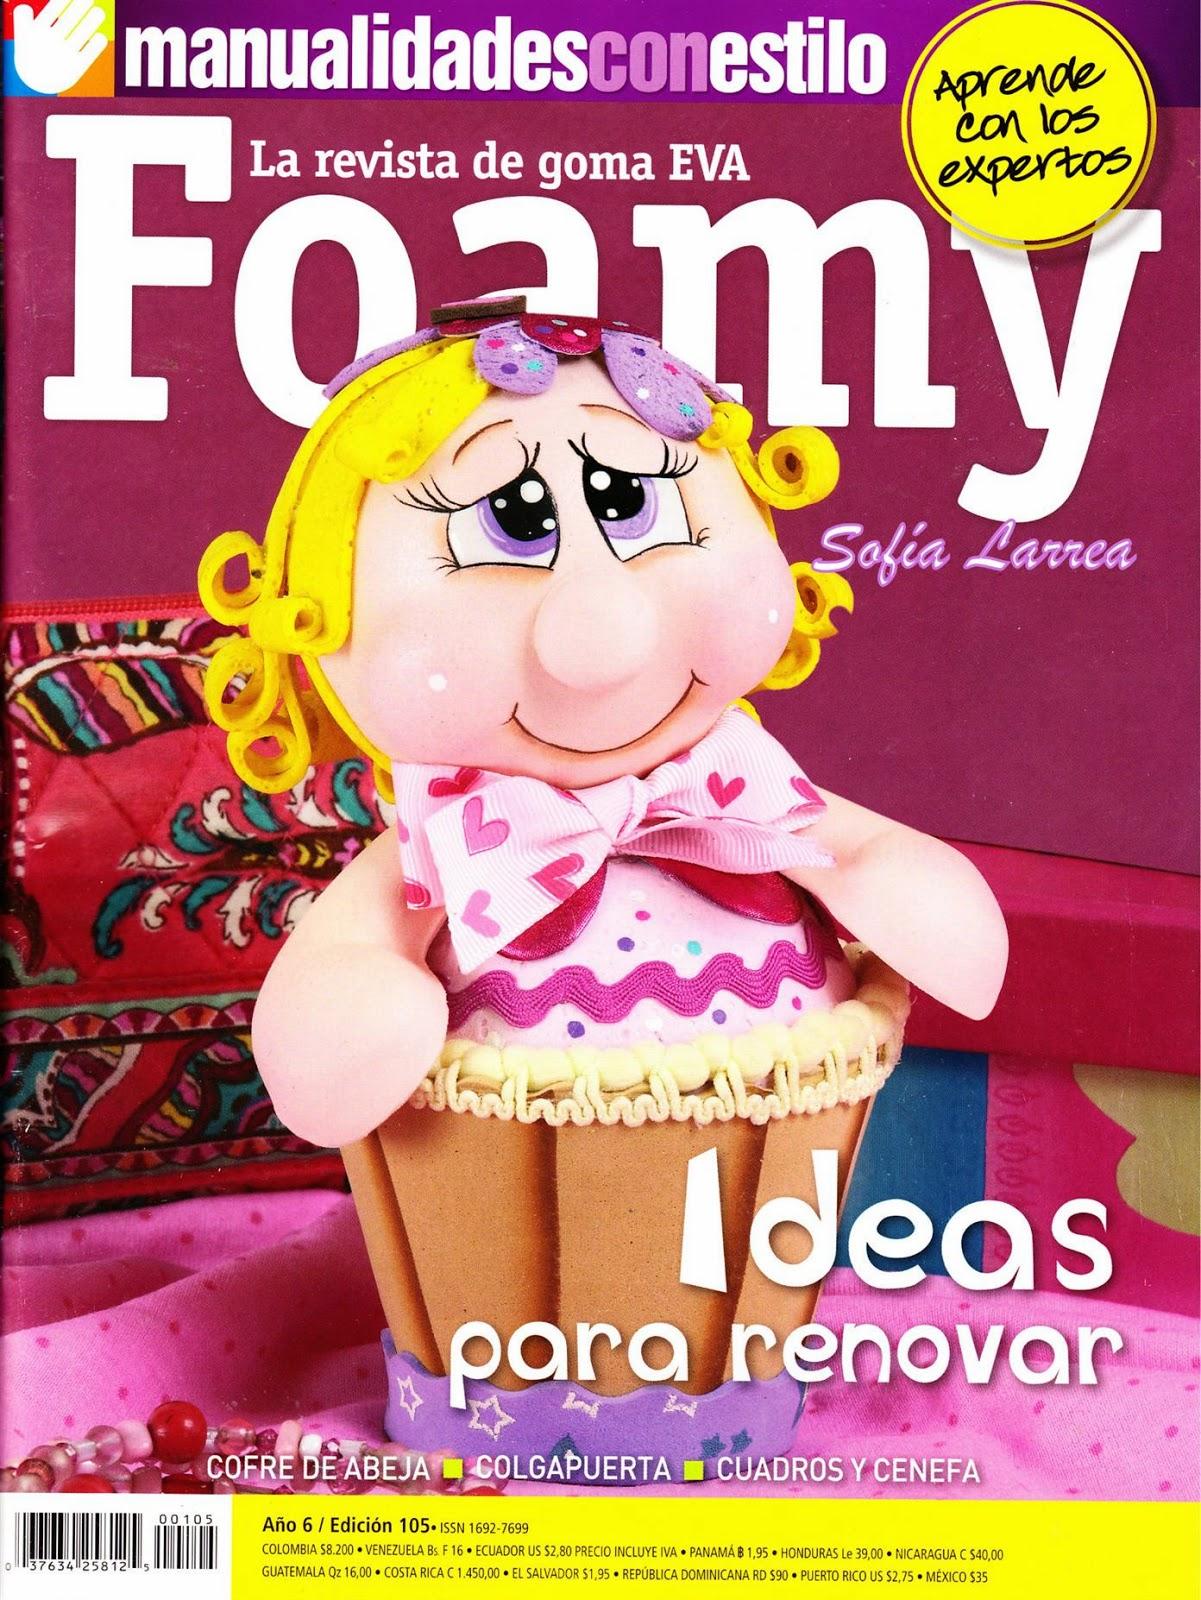 Revistas gratis manualidades con estilo - Revistas de manualidades ...